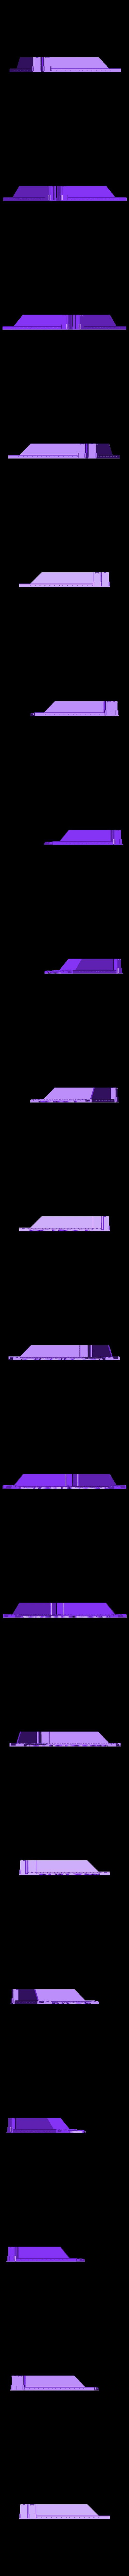 fixation_bottom_2nd_floor_v2.stl Download free STL file Damocles kickstarter modular industrial buildings sample • 3D print design, Alario